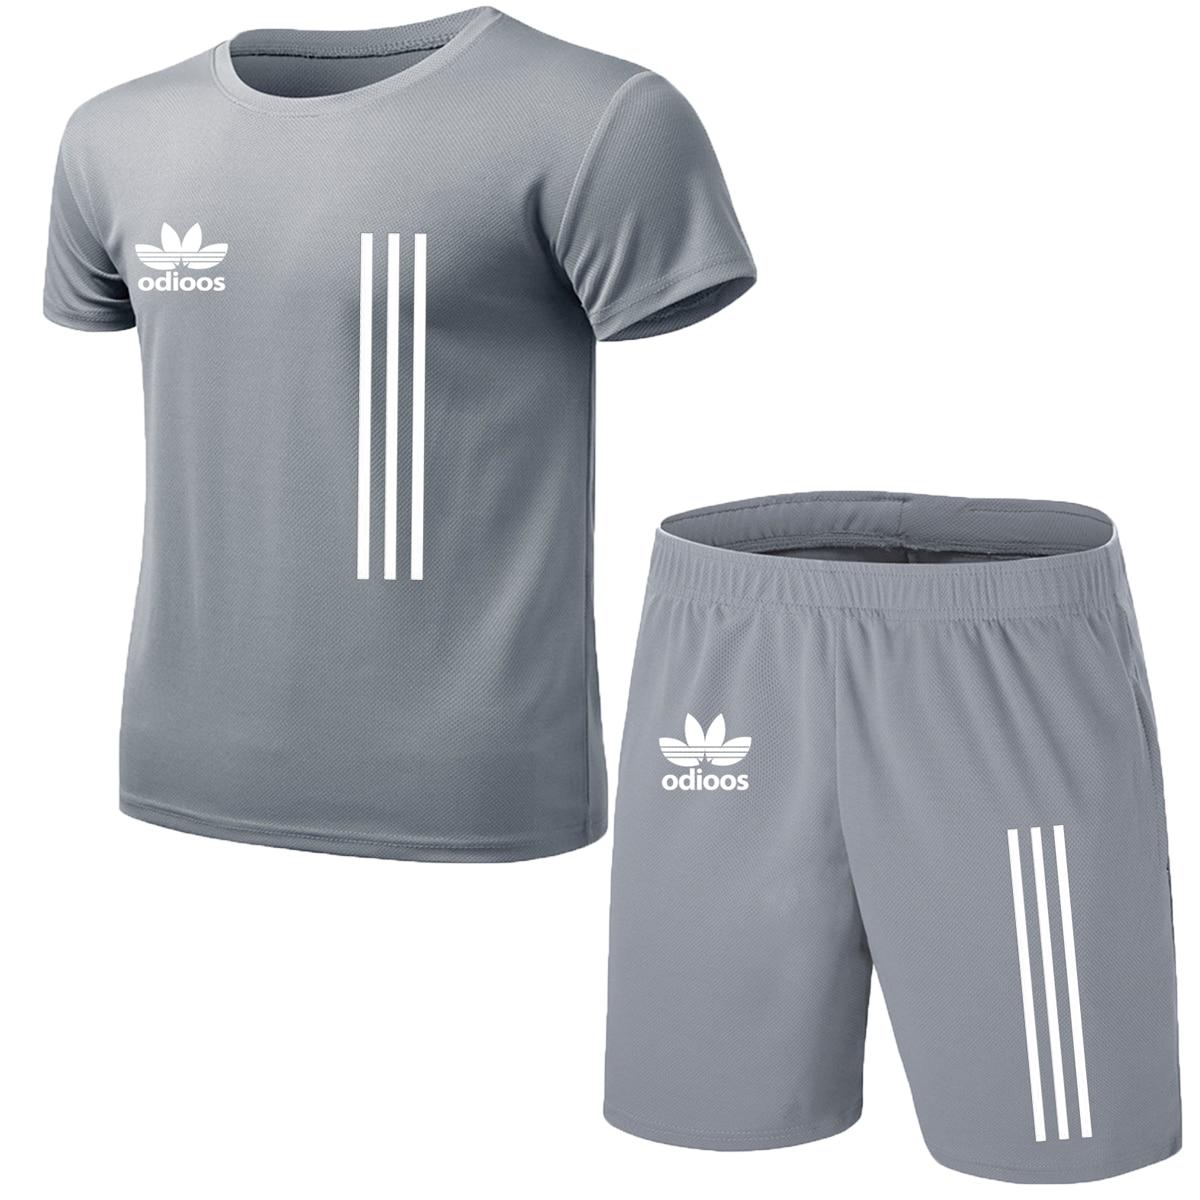 New men's sportswear 2020 summer two-piece men's short-sleeved T-shirt top shorts suit men's sportswear fitness running clothes